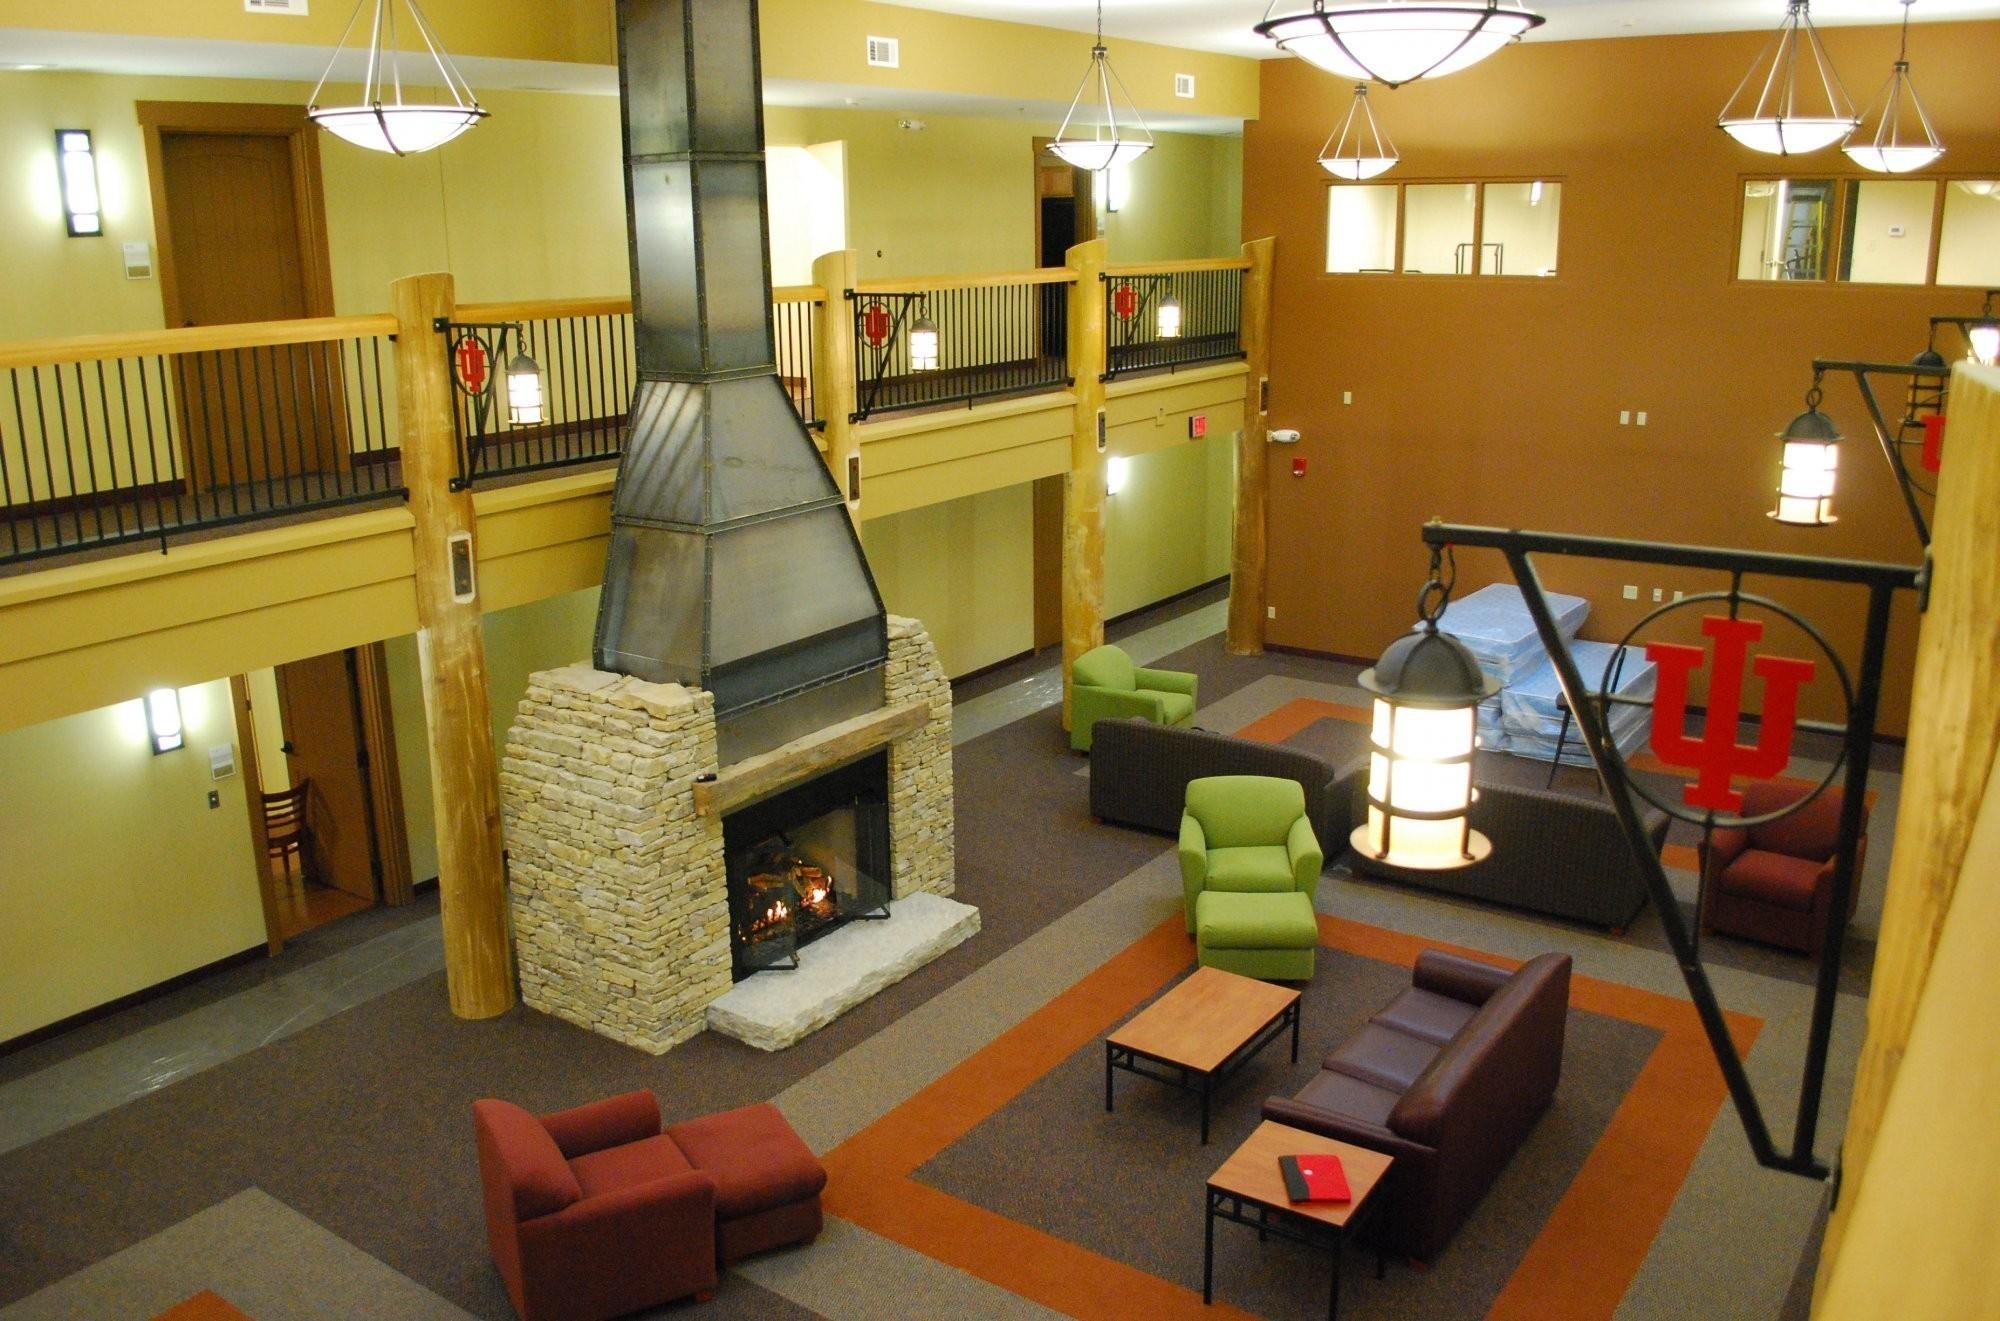 indiana-university-southeast-student-lodges-lounge